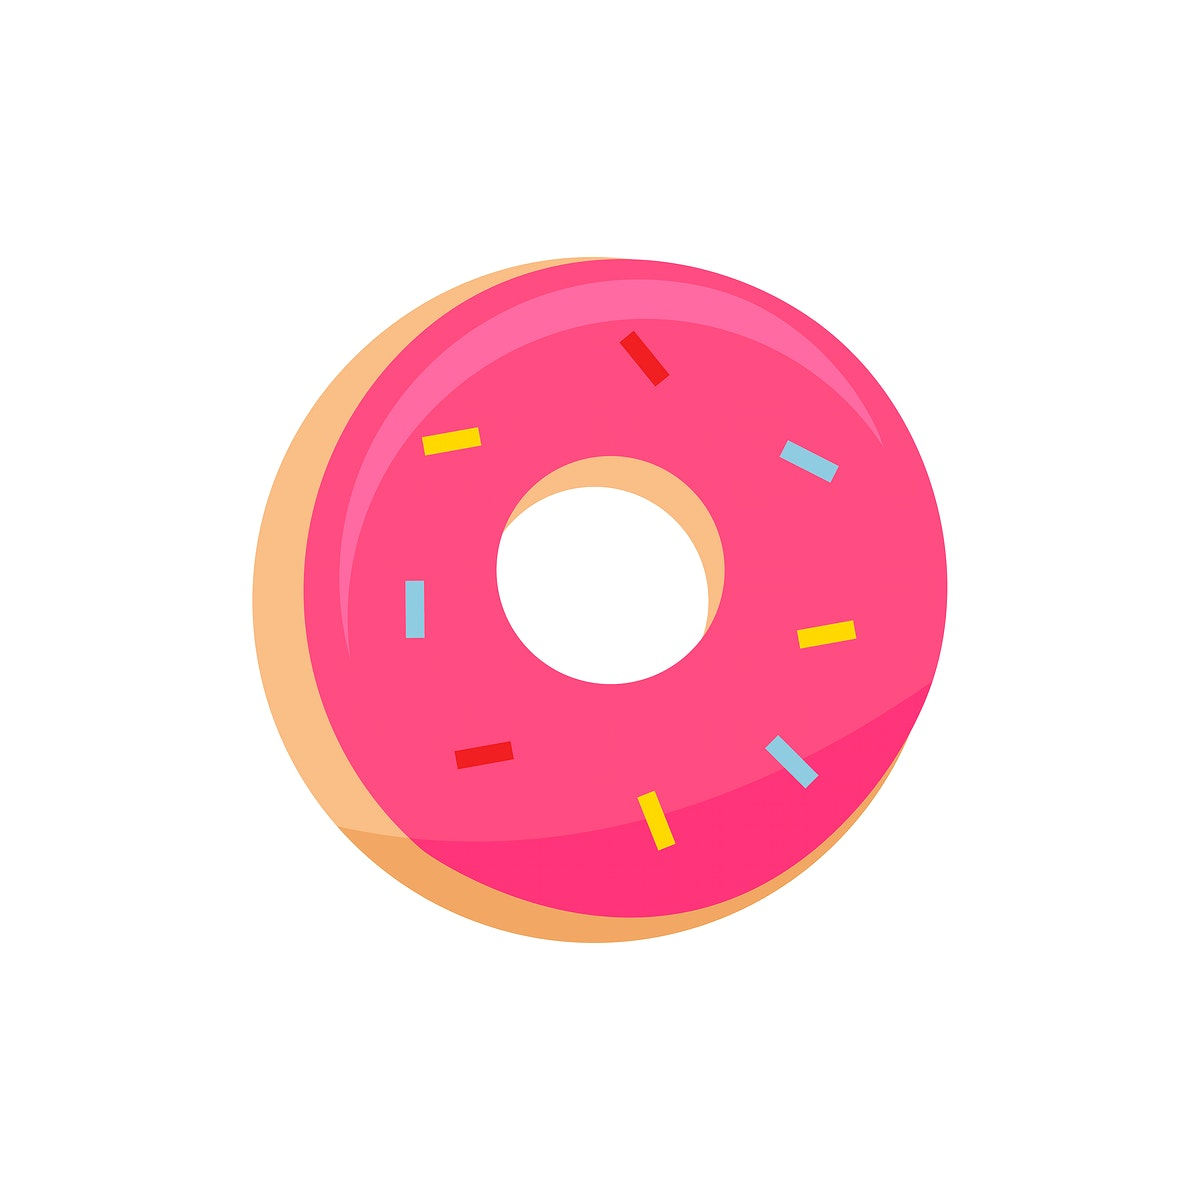 Pink doughnut icon graphic illustration